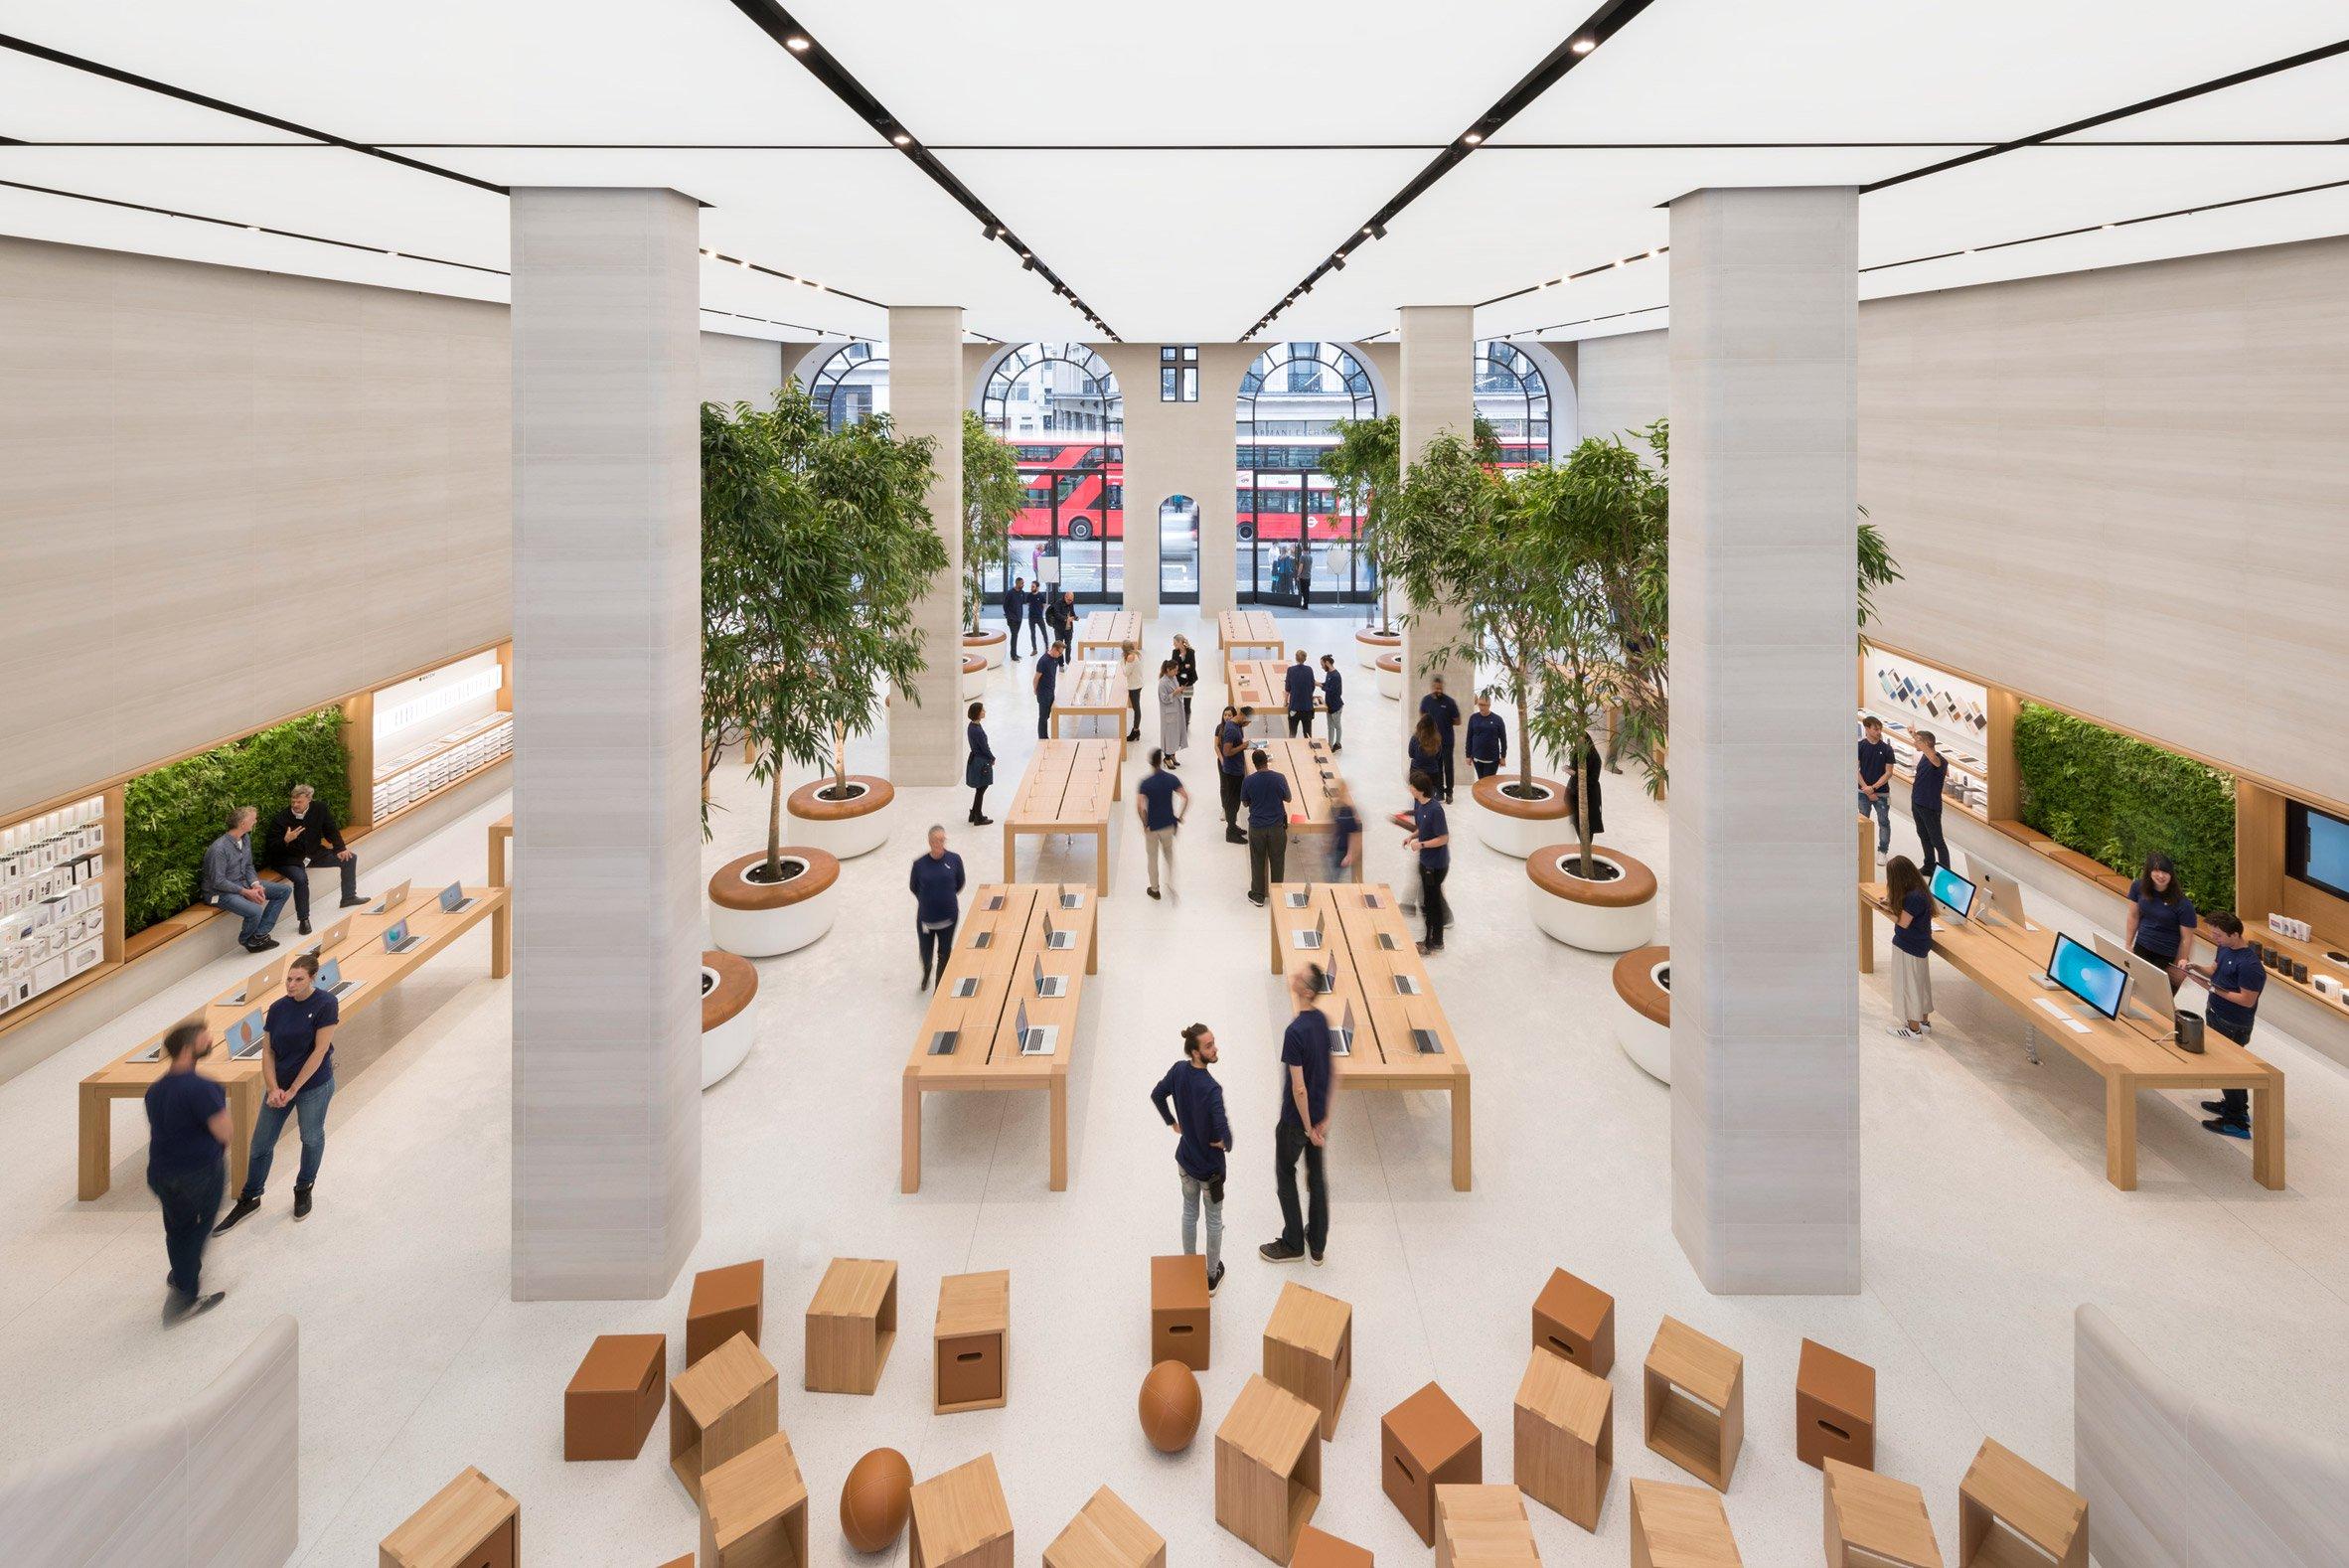 apple-regent-street-foster-partners-london_dezeen_2364_col_4.jpg